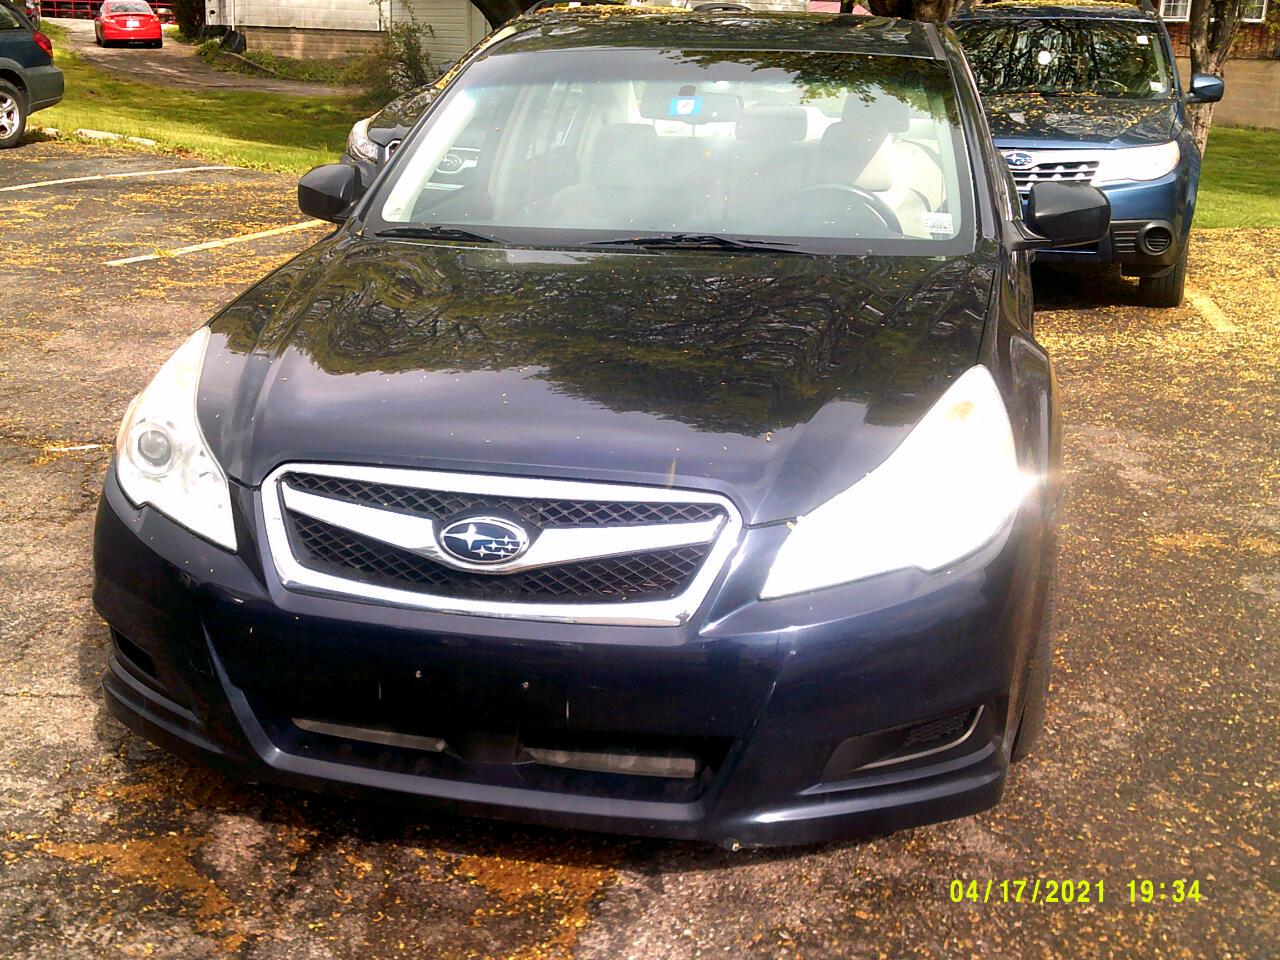 Subaru Legacy 4dr Sdn H6 Auto 3.6R Premium 2012